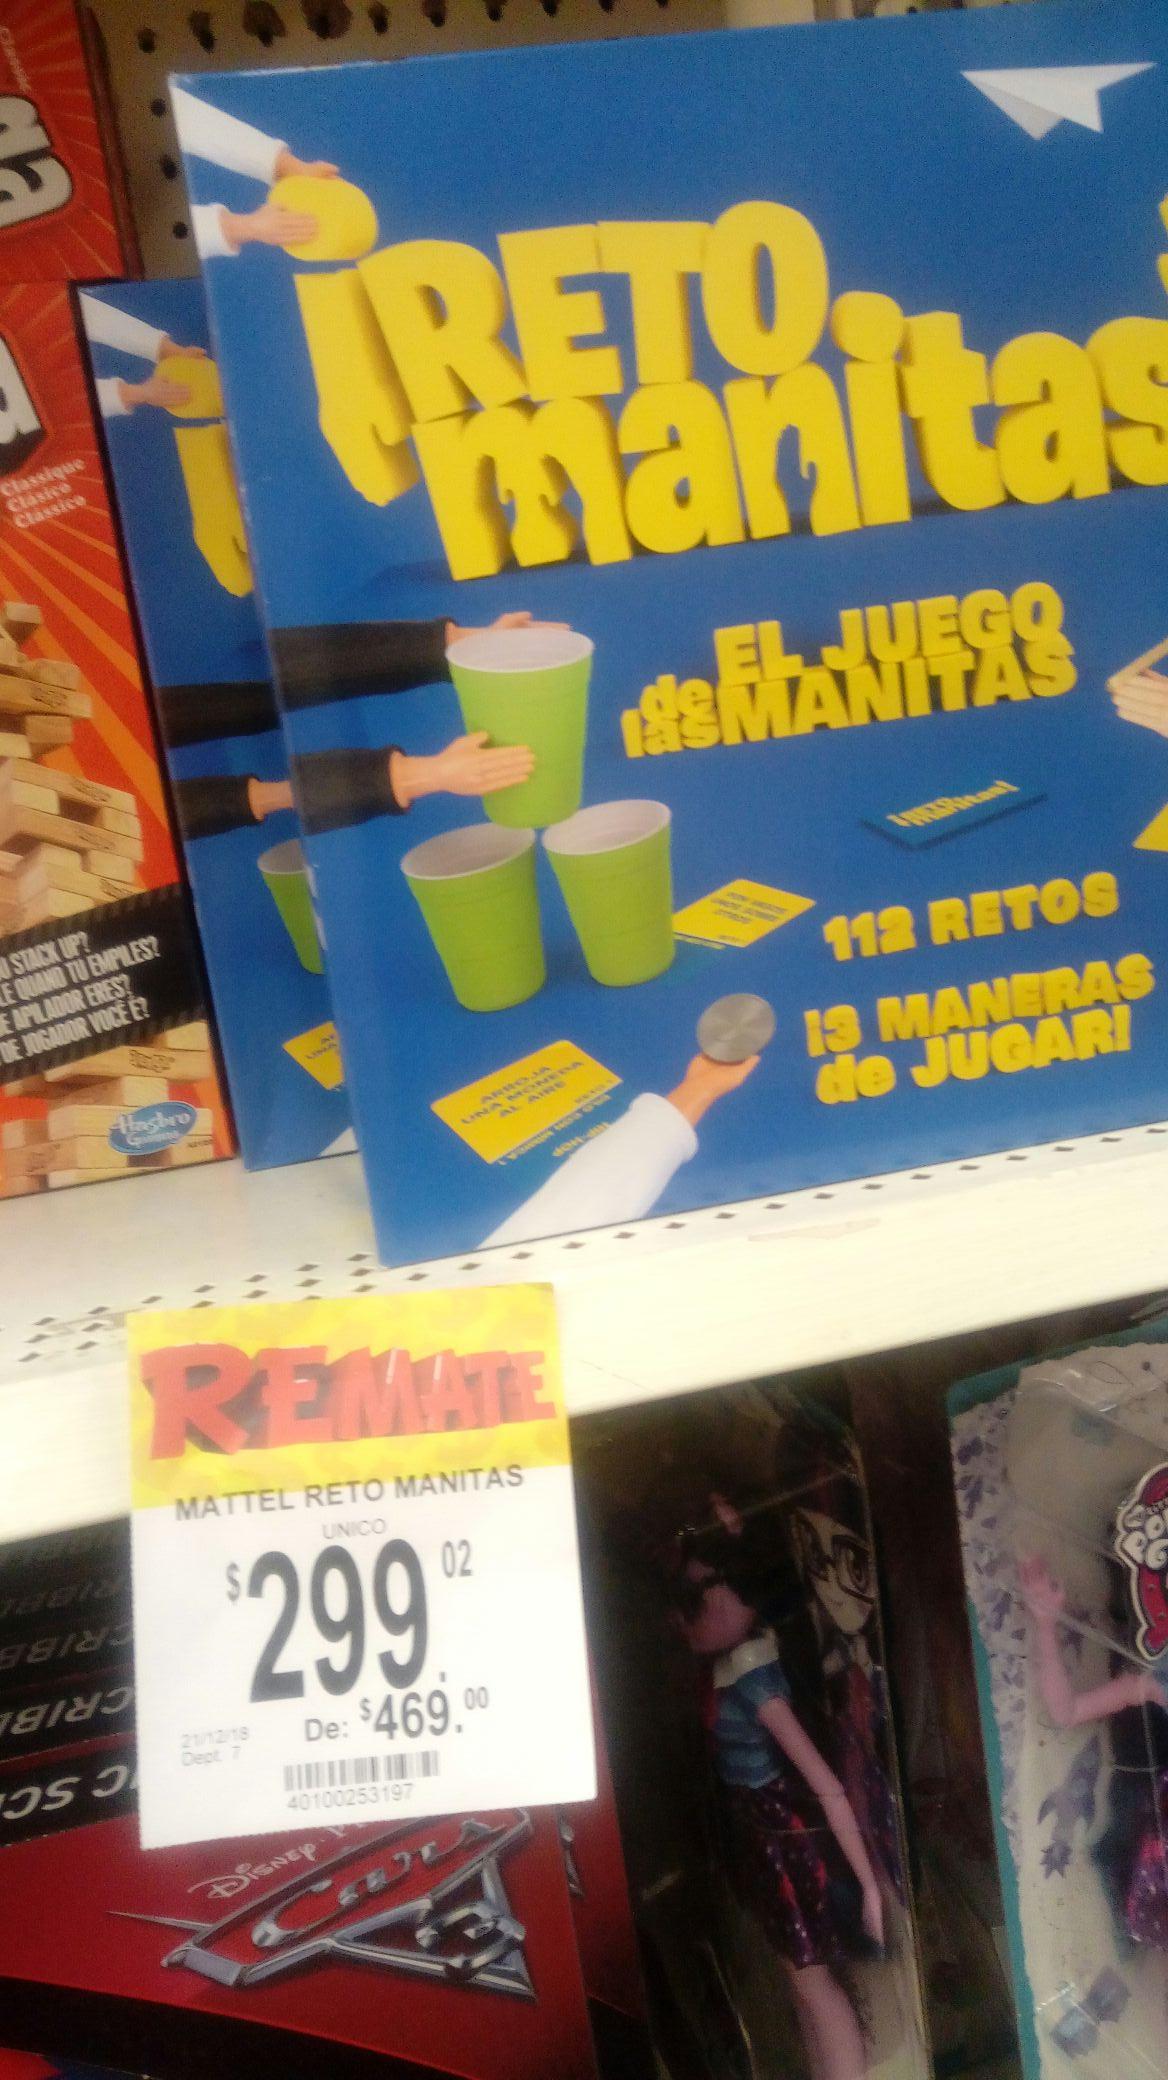 Bodega Aurrera Reto Manitas Juego De Mesa Mattel Promodescuentos Com